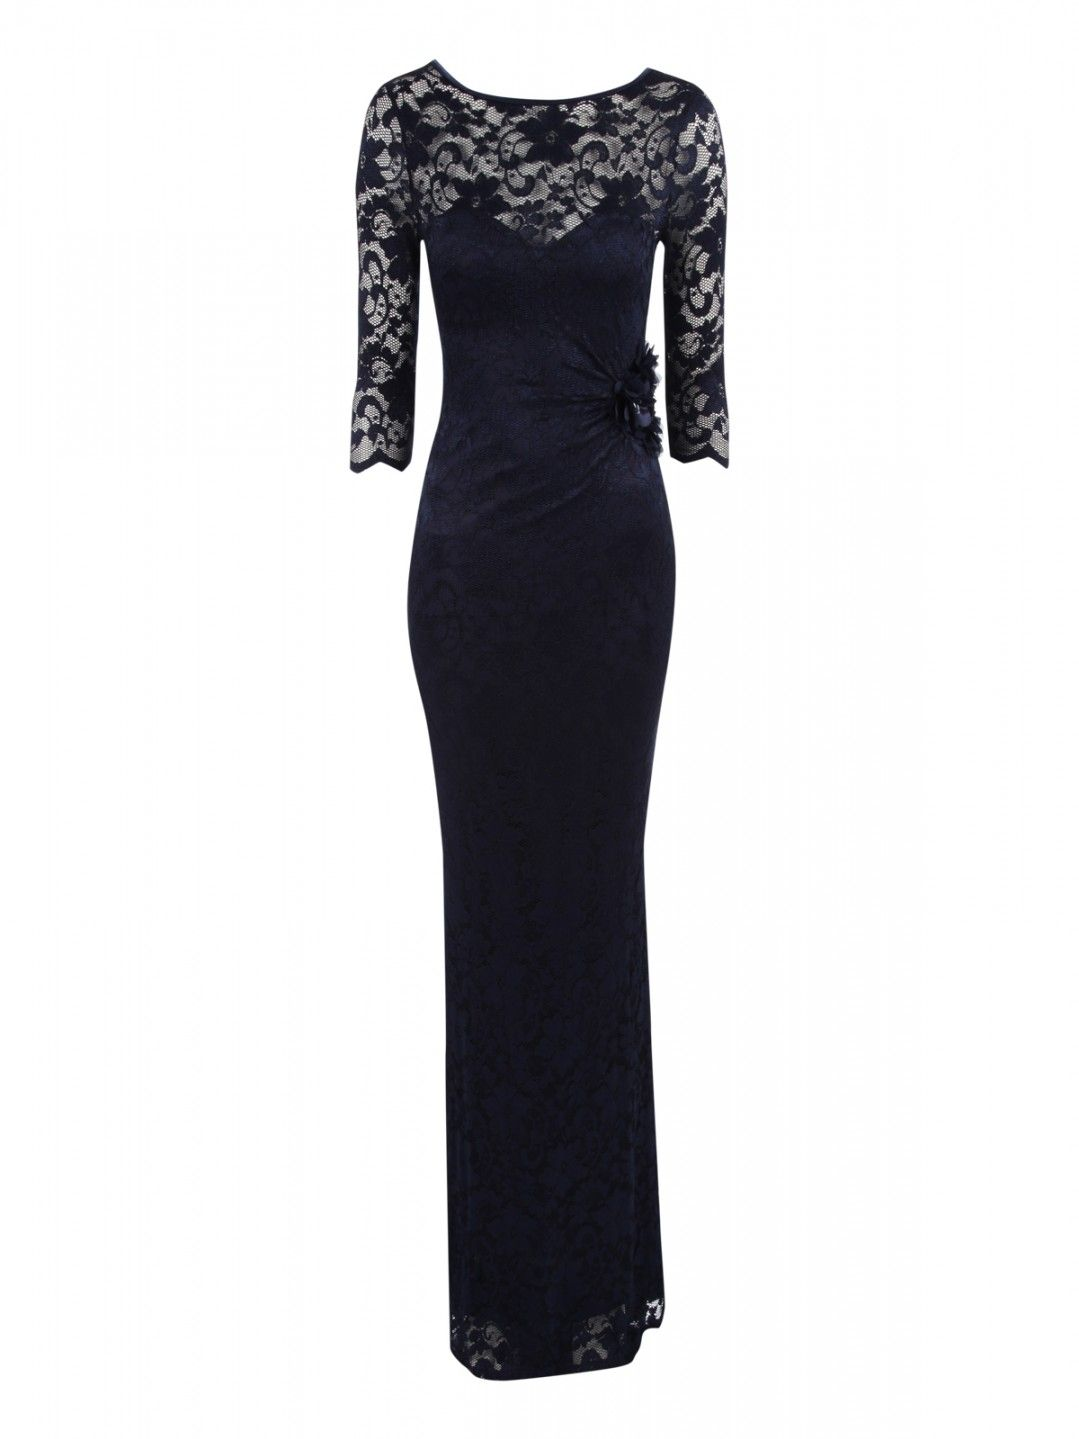 Lace Corsage Maxi Dress Jane Norman Dresses Maxi Dress Beautiful Dresses